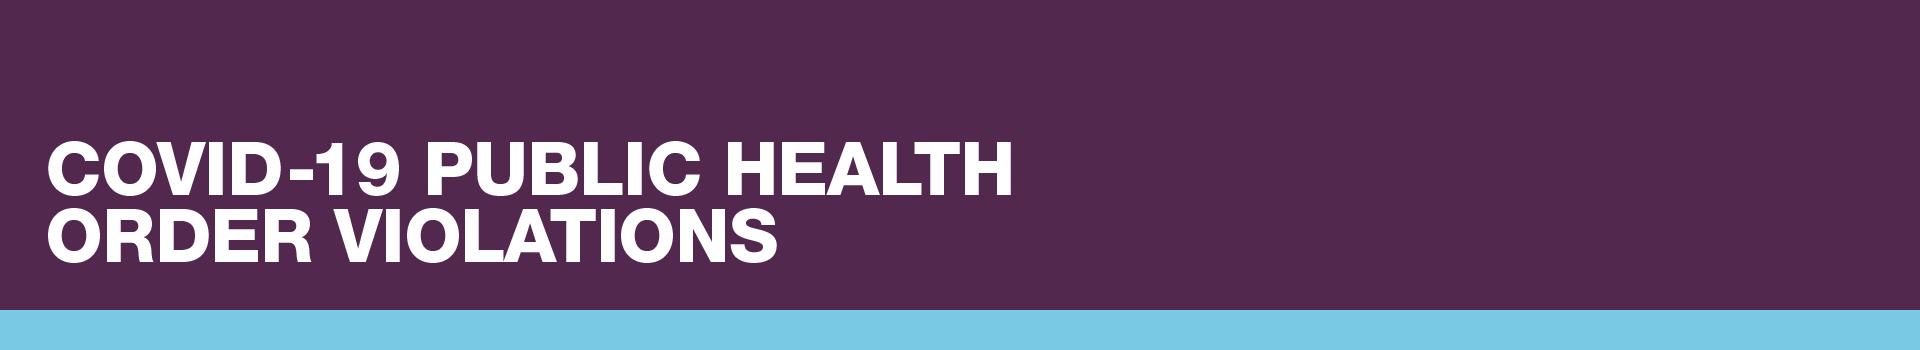 Contact Environmental Public Health Alberta Health Services